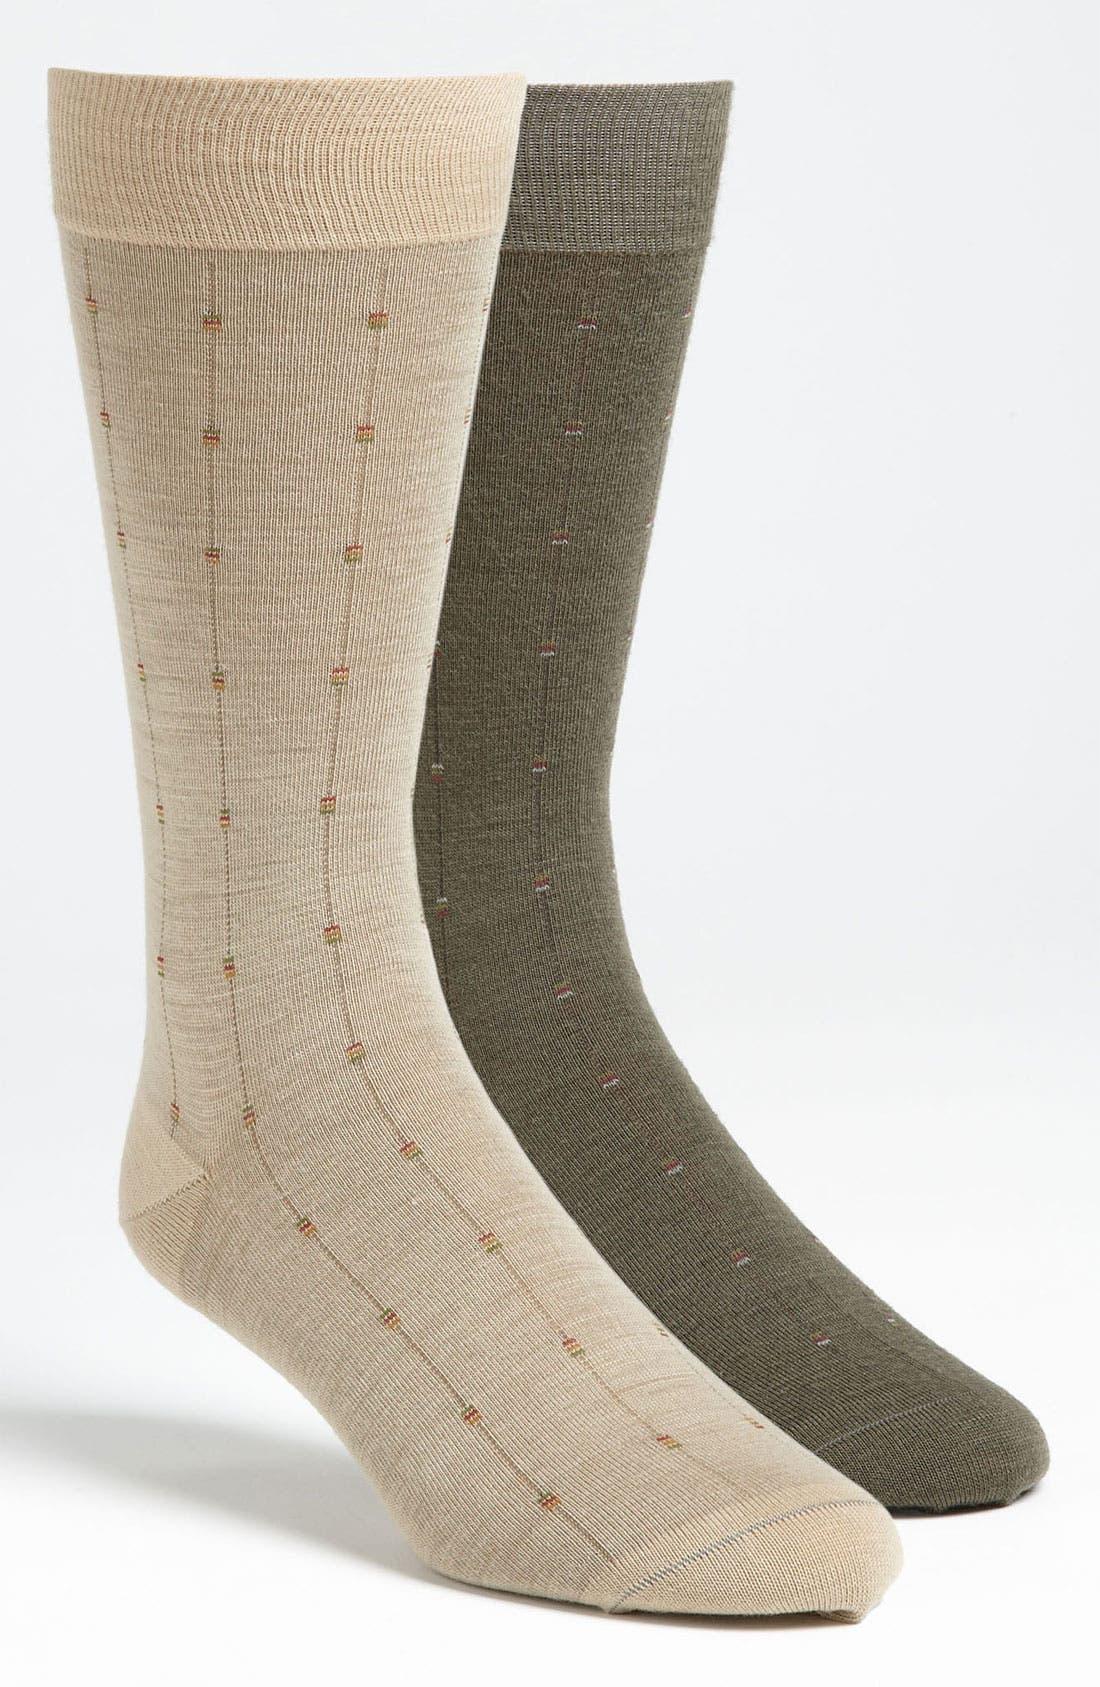 Main Image - Pantherella 'Bellringer' Socks (2-Pack)